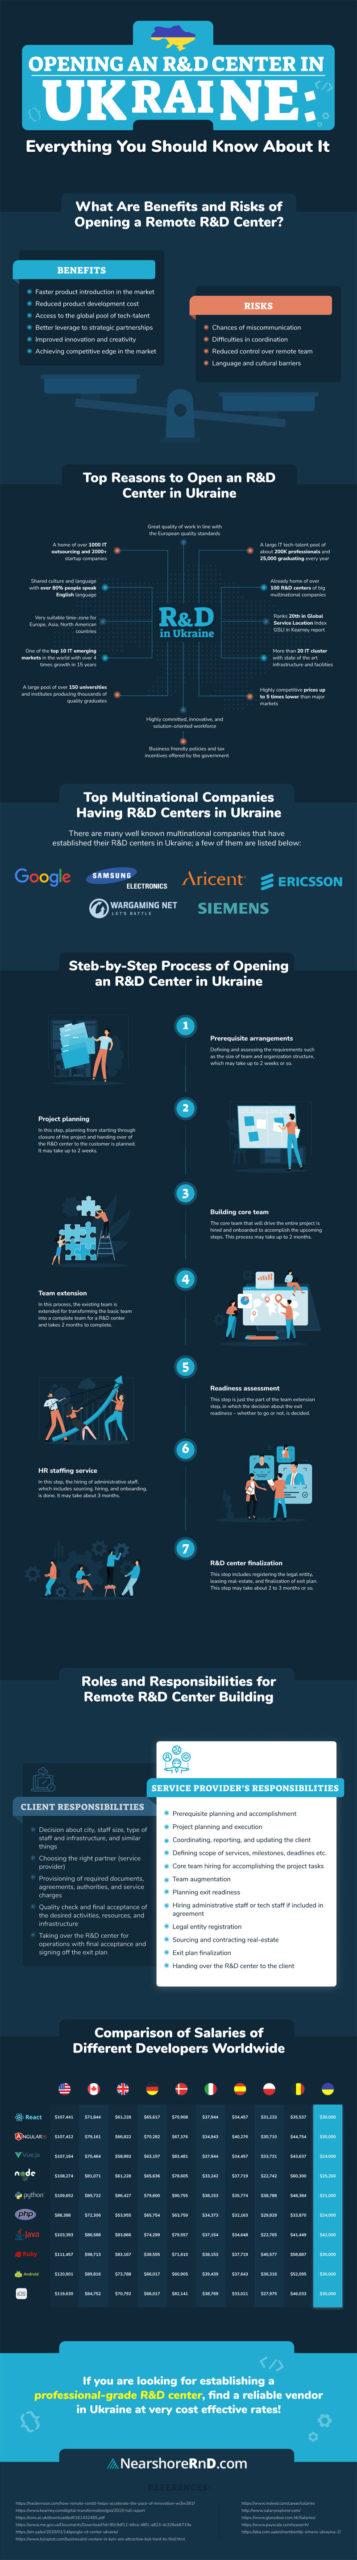 establishing rd lab ukraine infographic